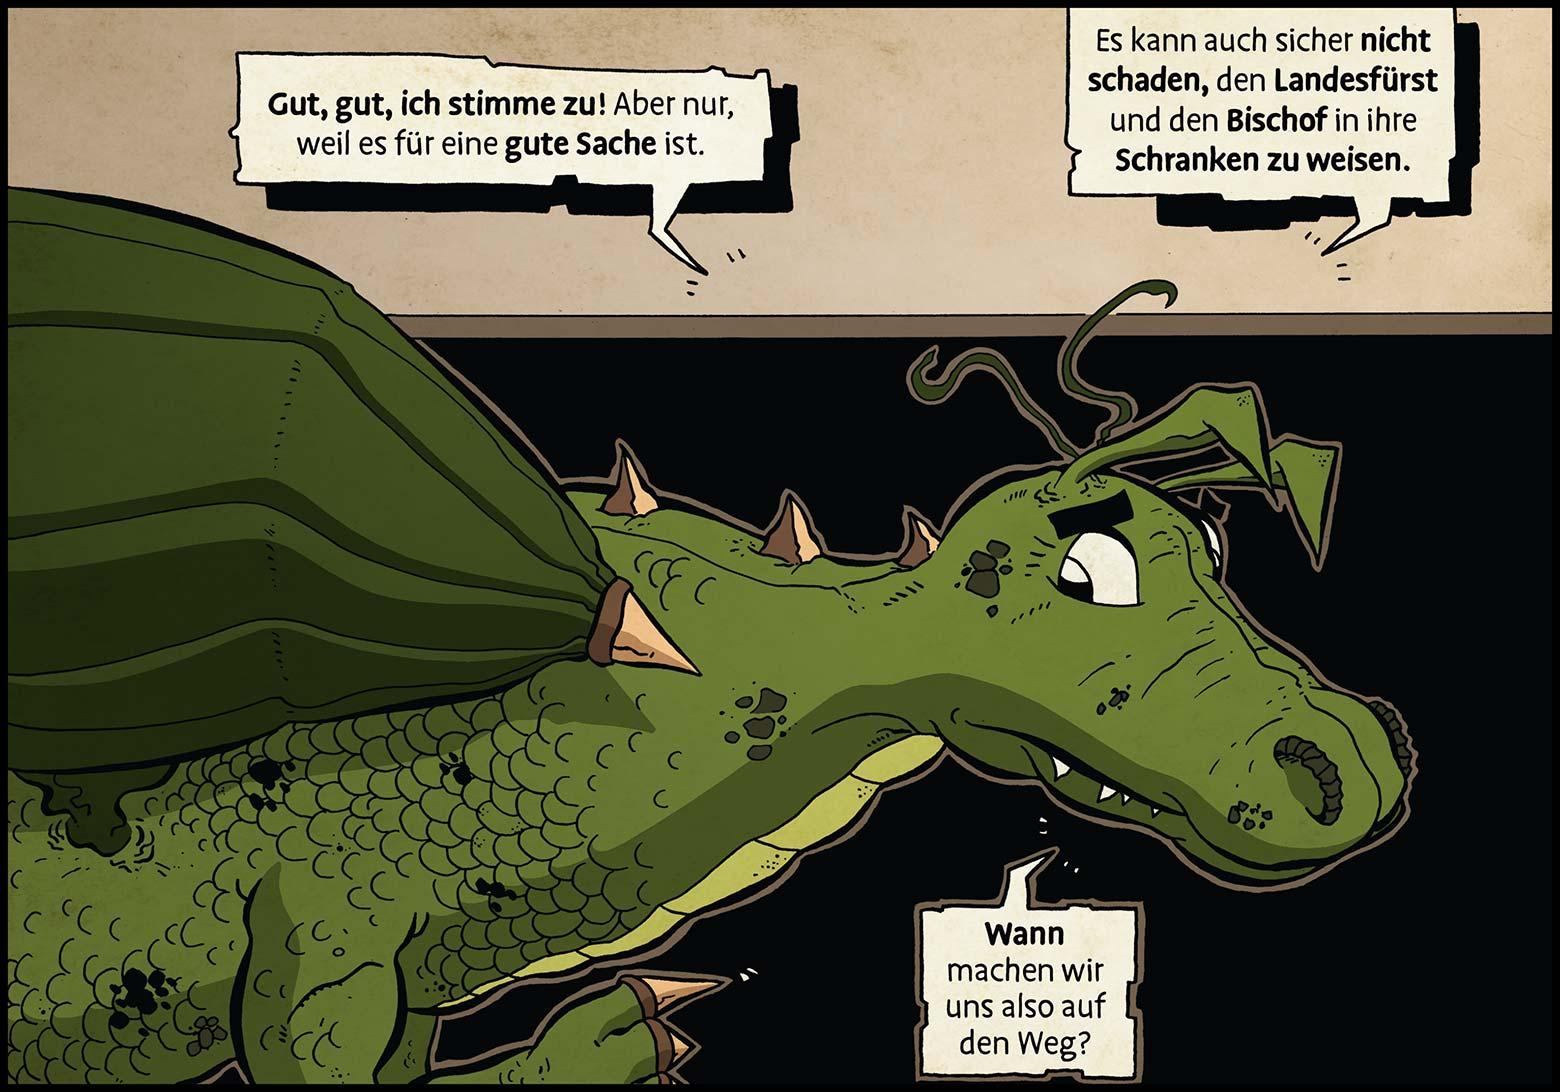 Band 1: Seite 51 (Online-Comic: Ritter Randolf)